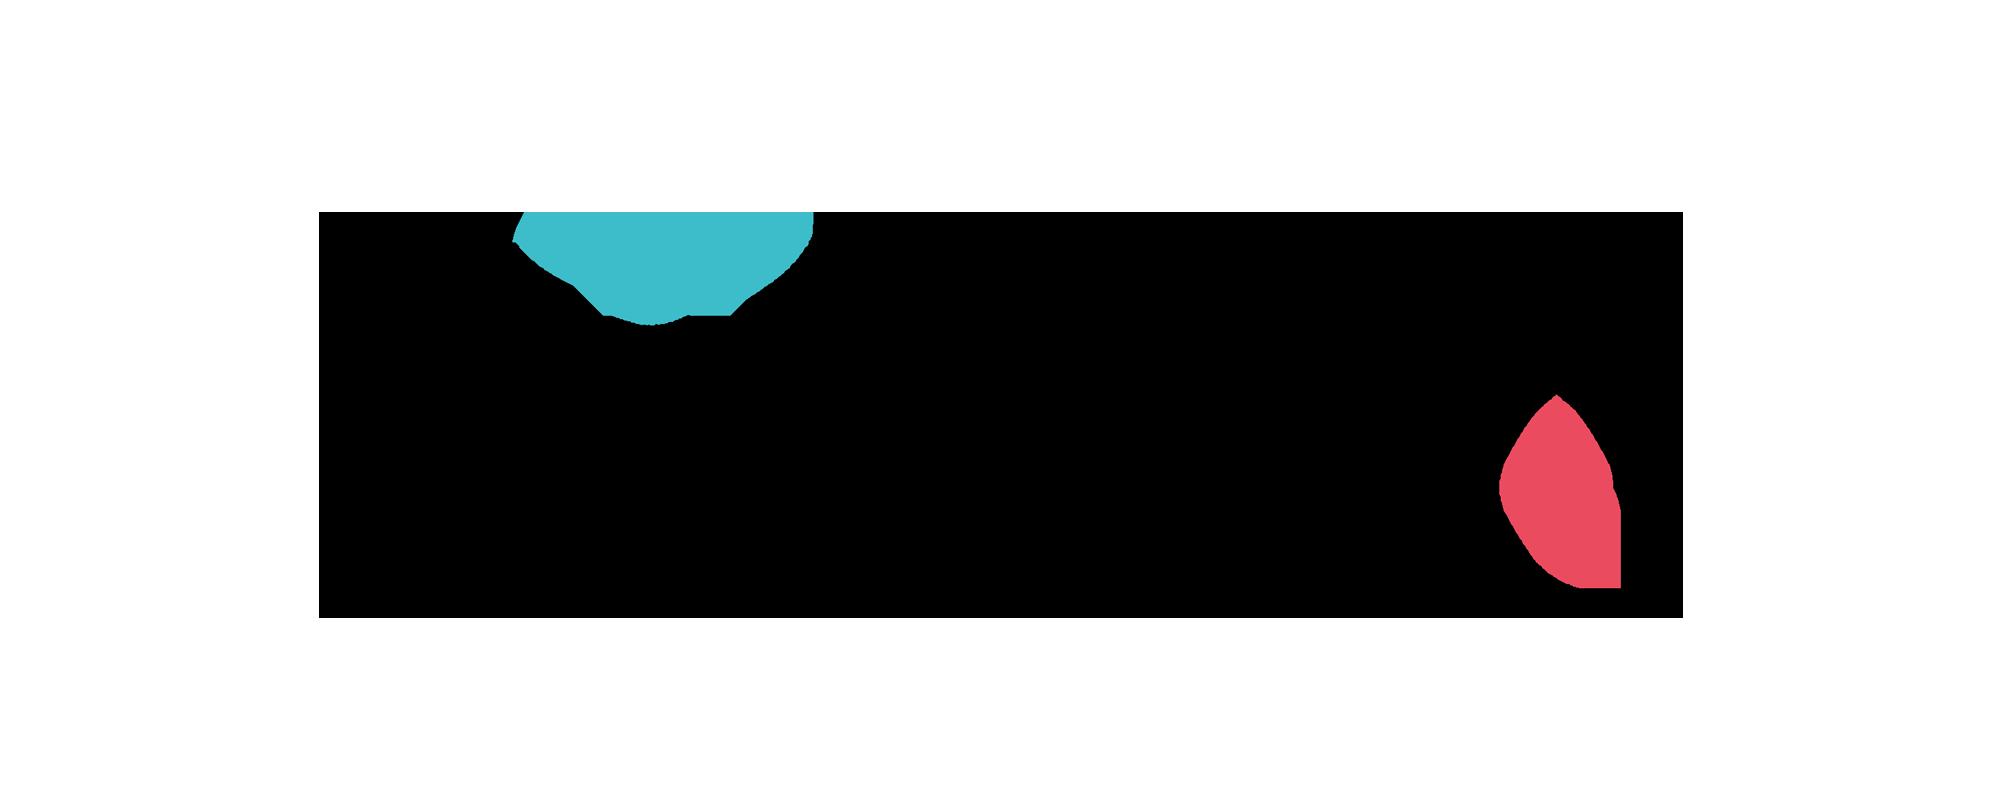 Kim_logo-012